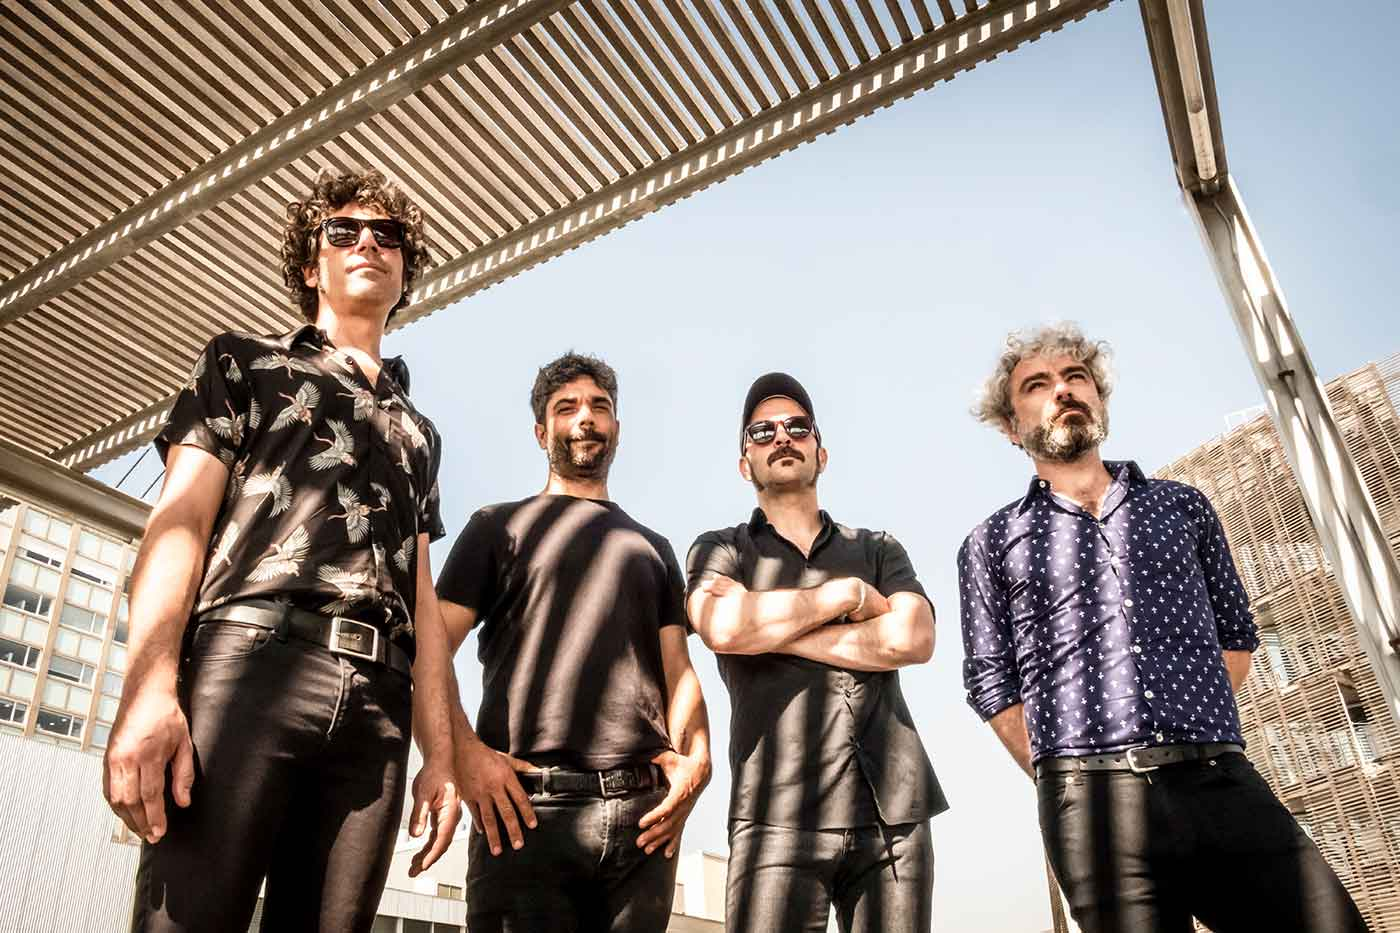 León Benavente se suma al cartel de MUWI La Rioja Music Fest 2020